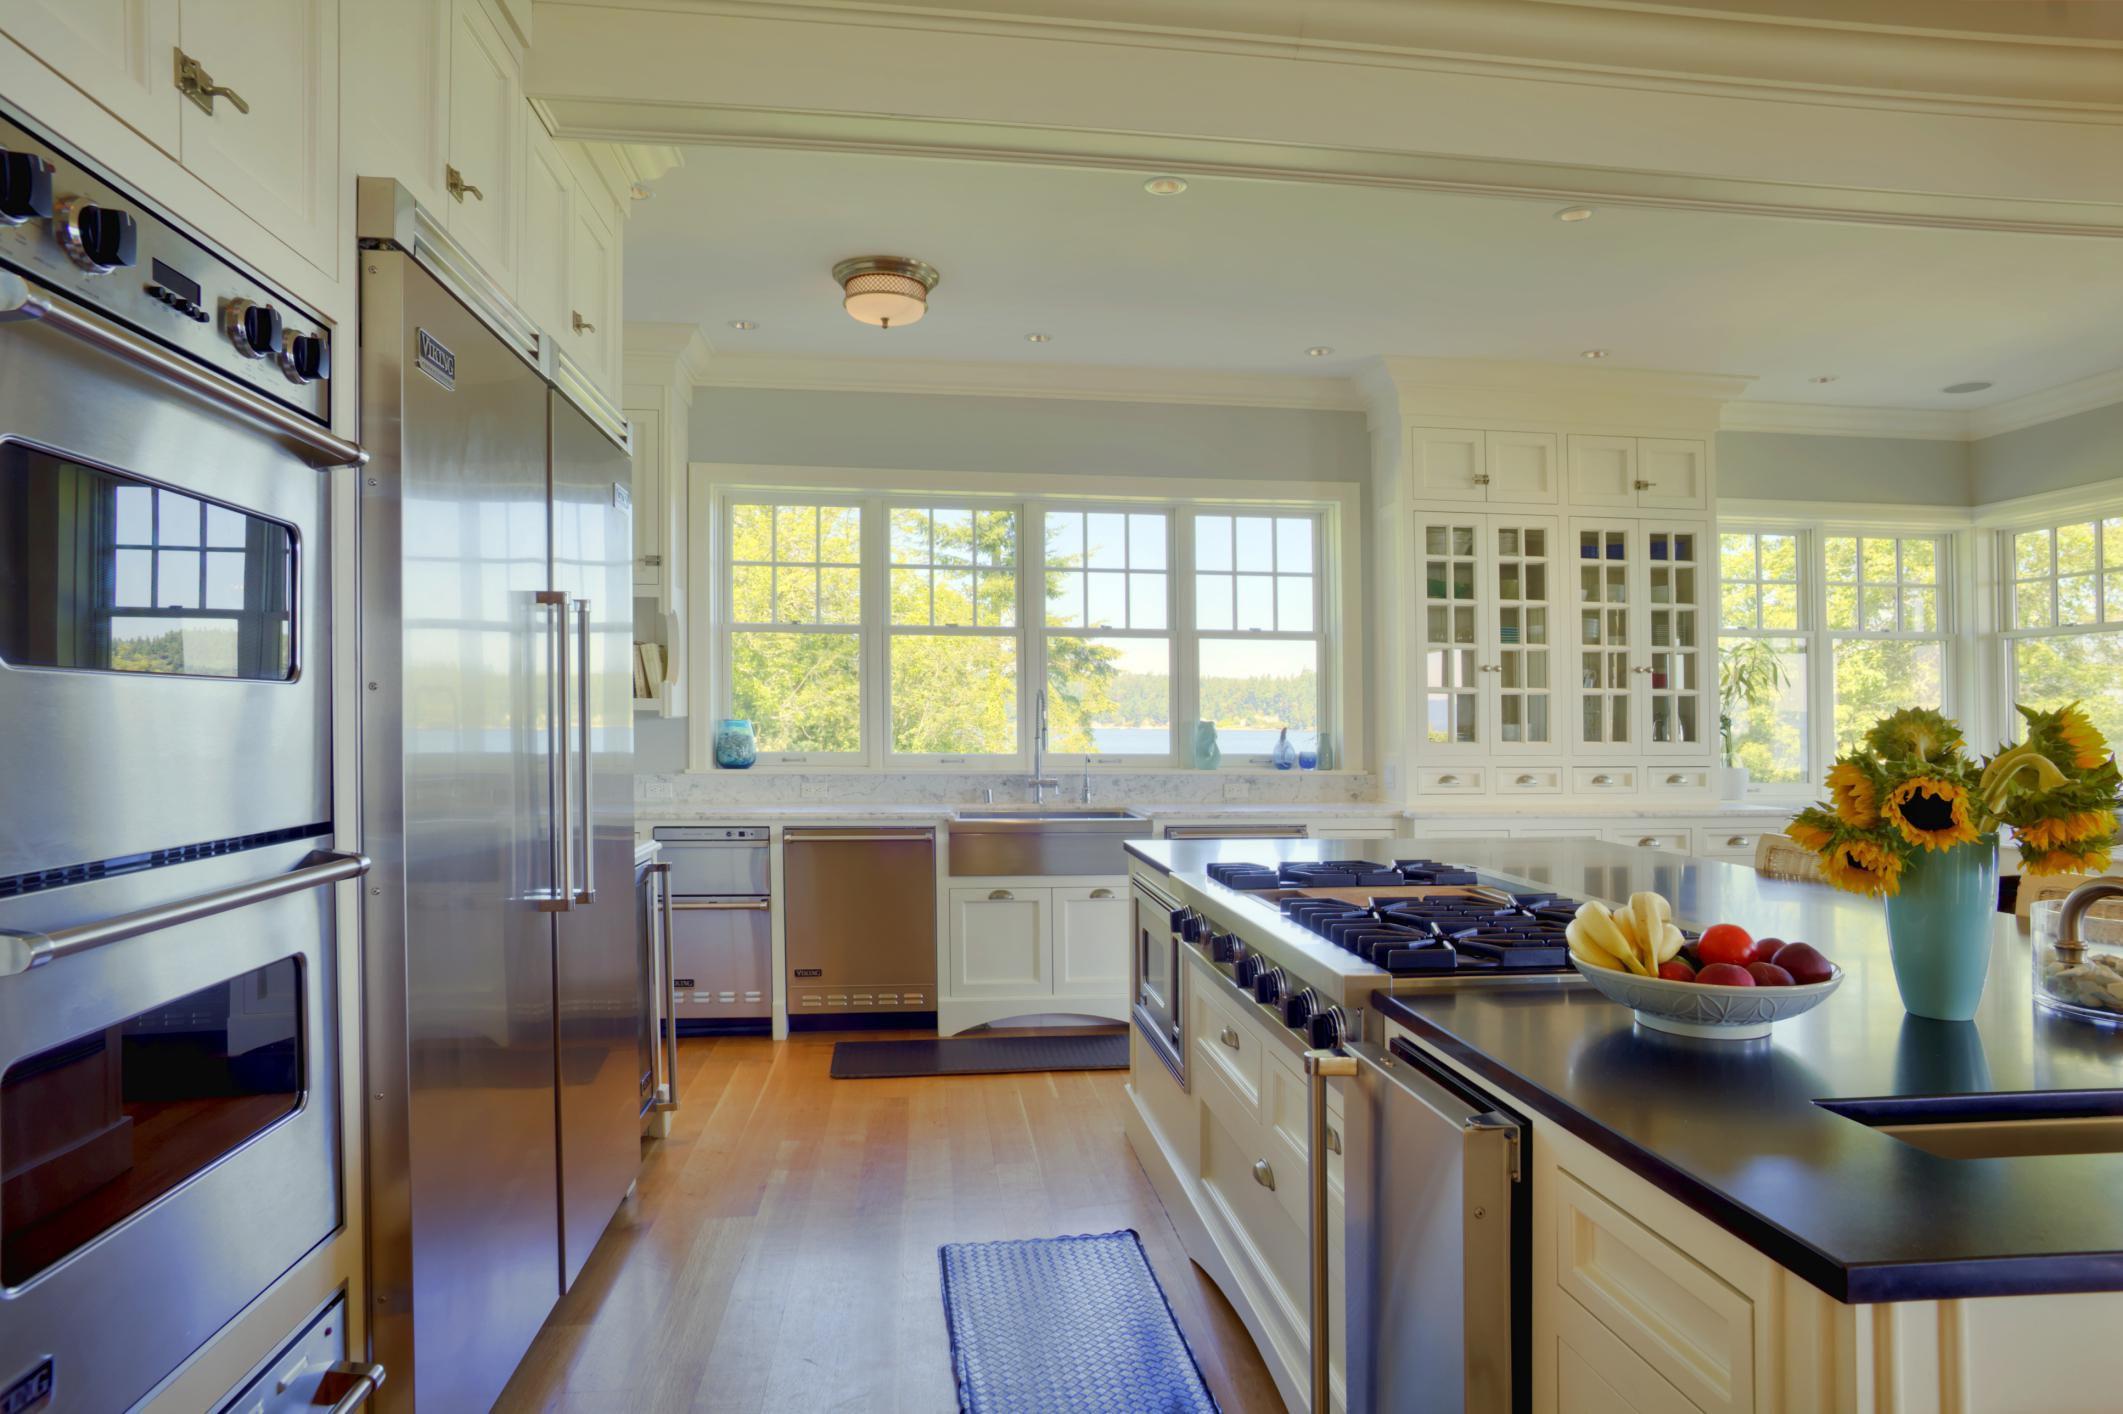 U shaped kitchen design photos 13 x 13 magnificent home design for Kitchen design 8 x 13